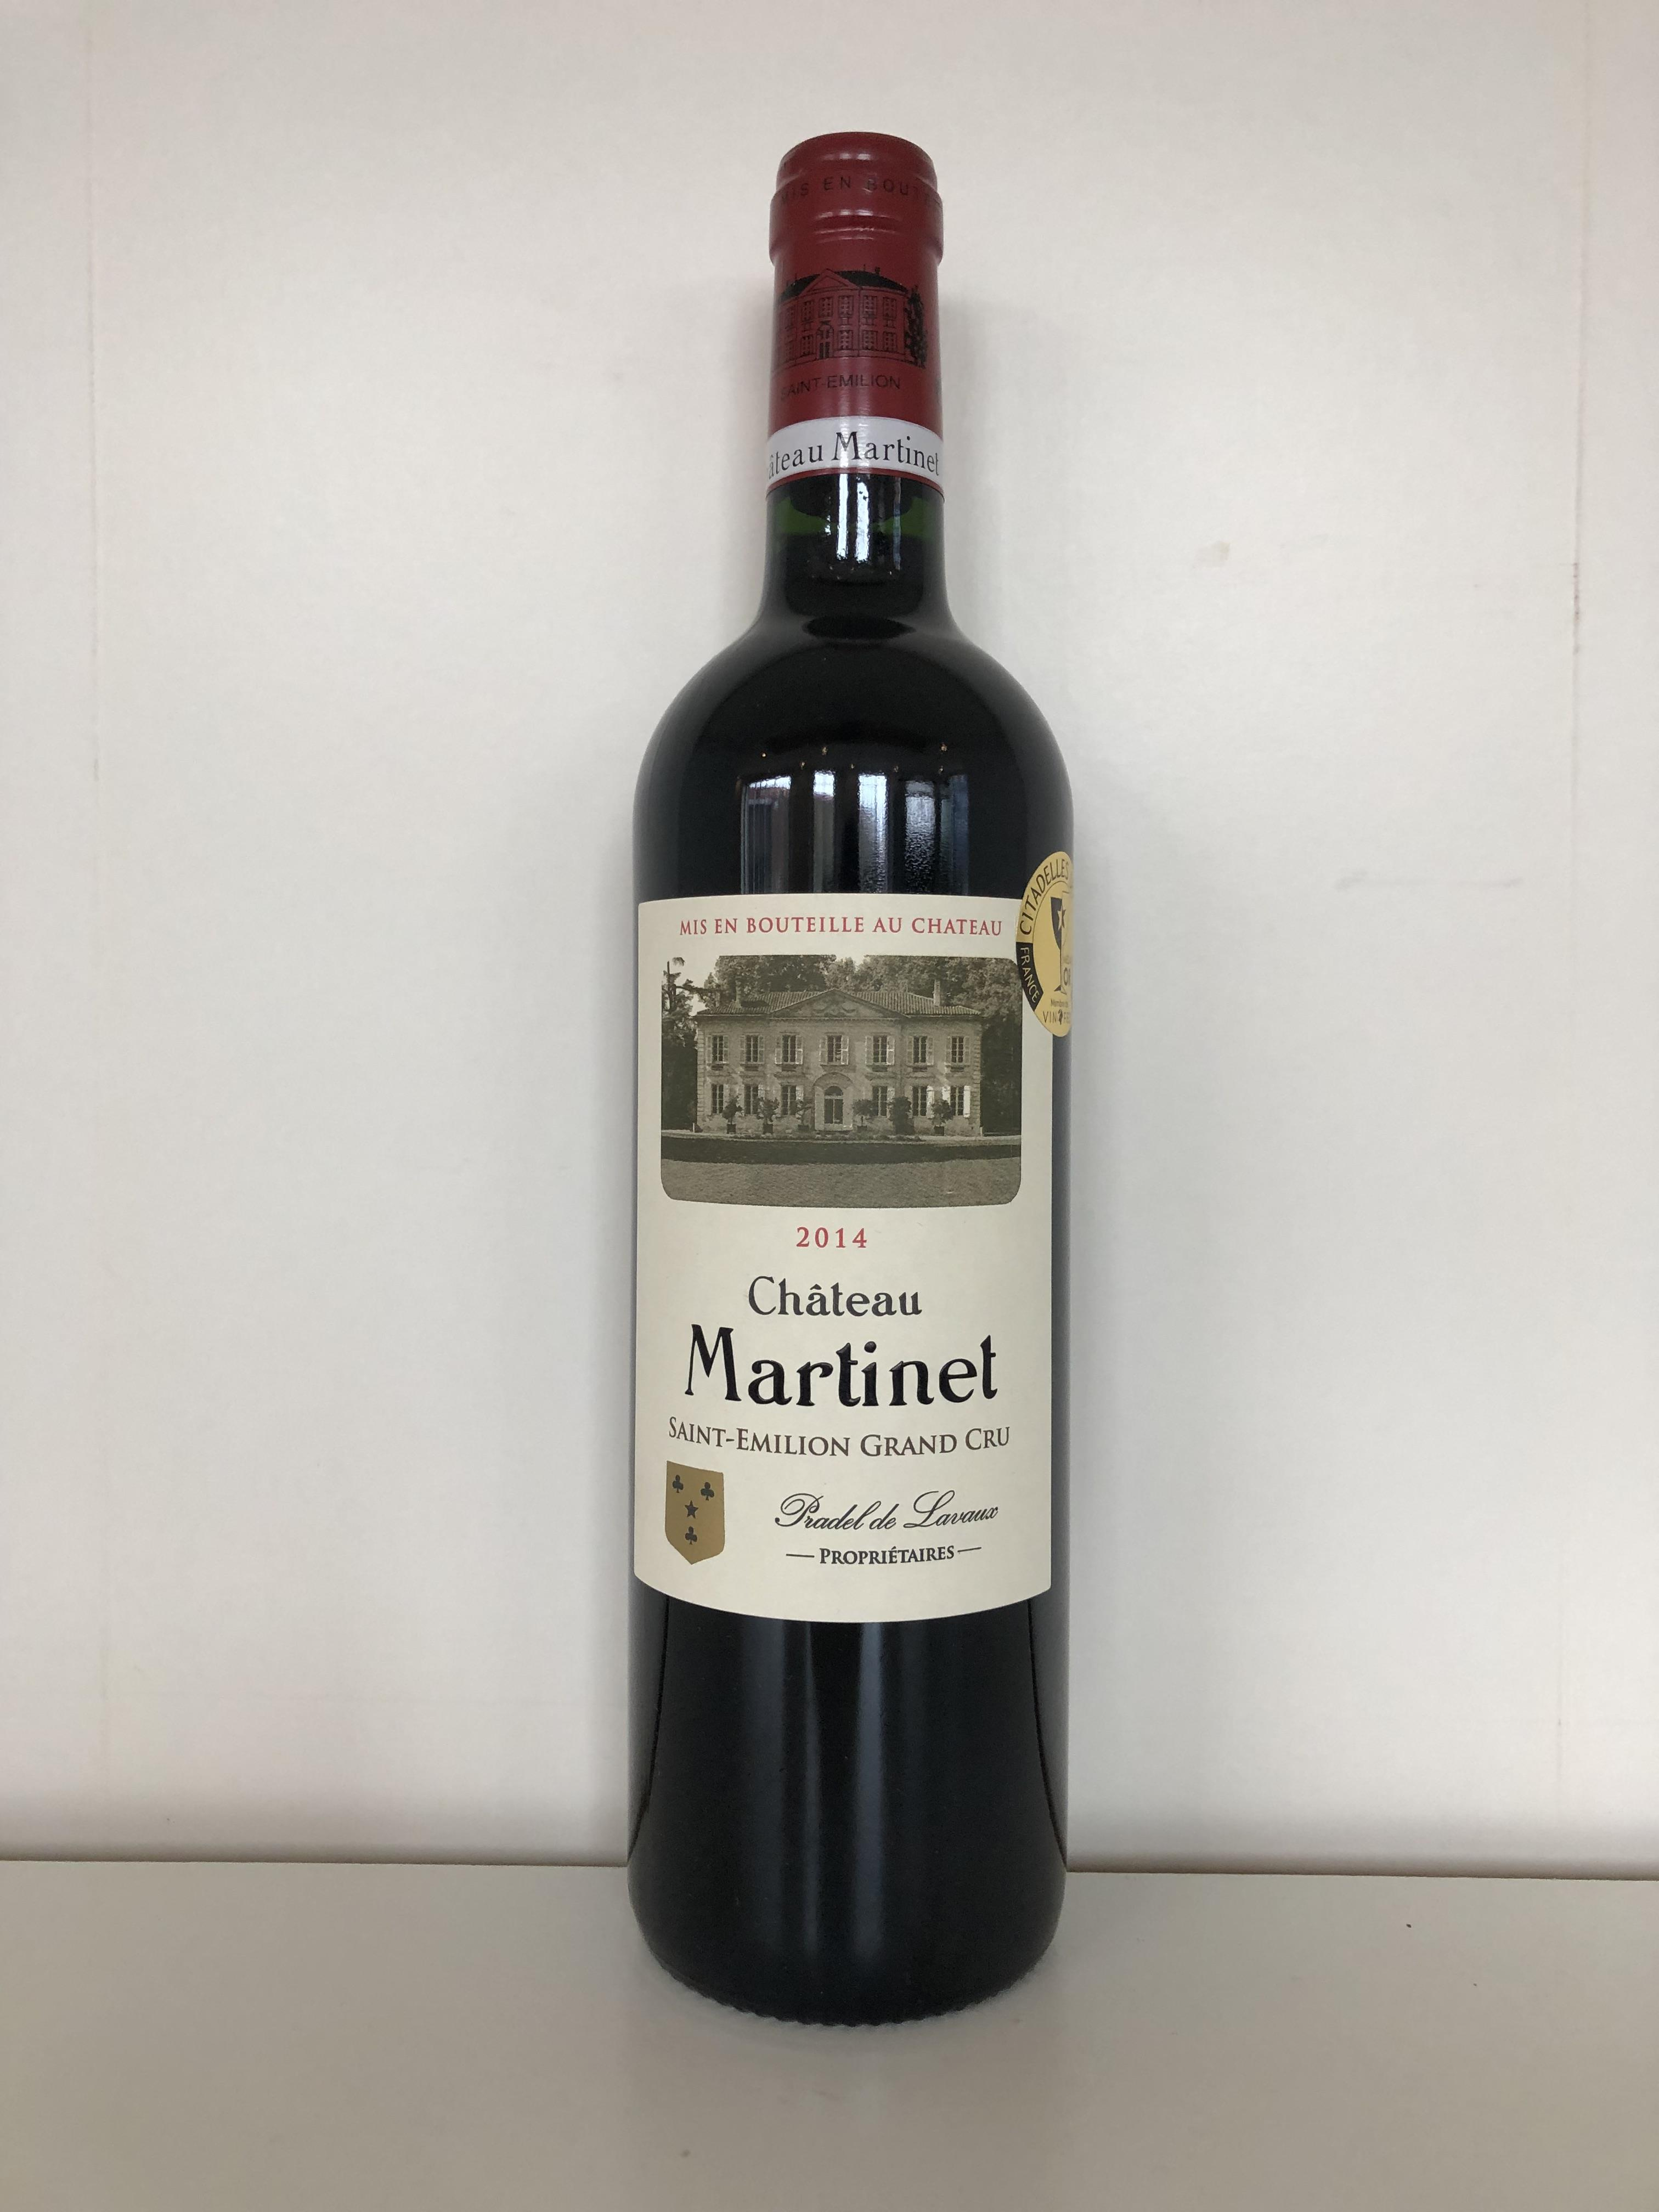 2014 Martinet, St Emilion GC, Bordeaux, France, 12 bottles - Image 2 of 2